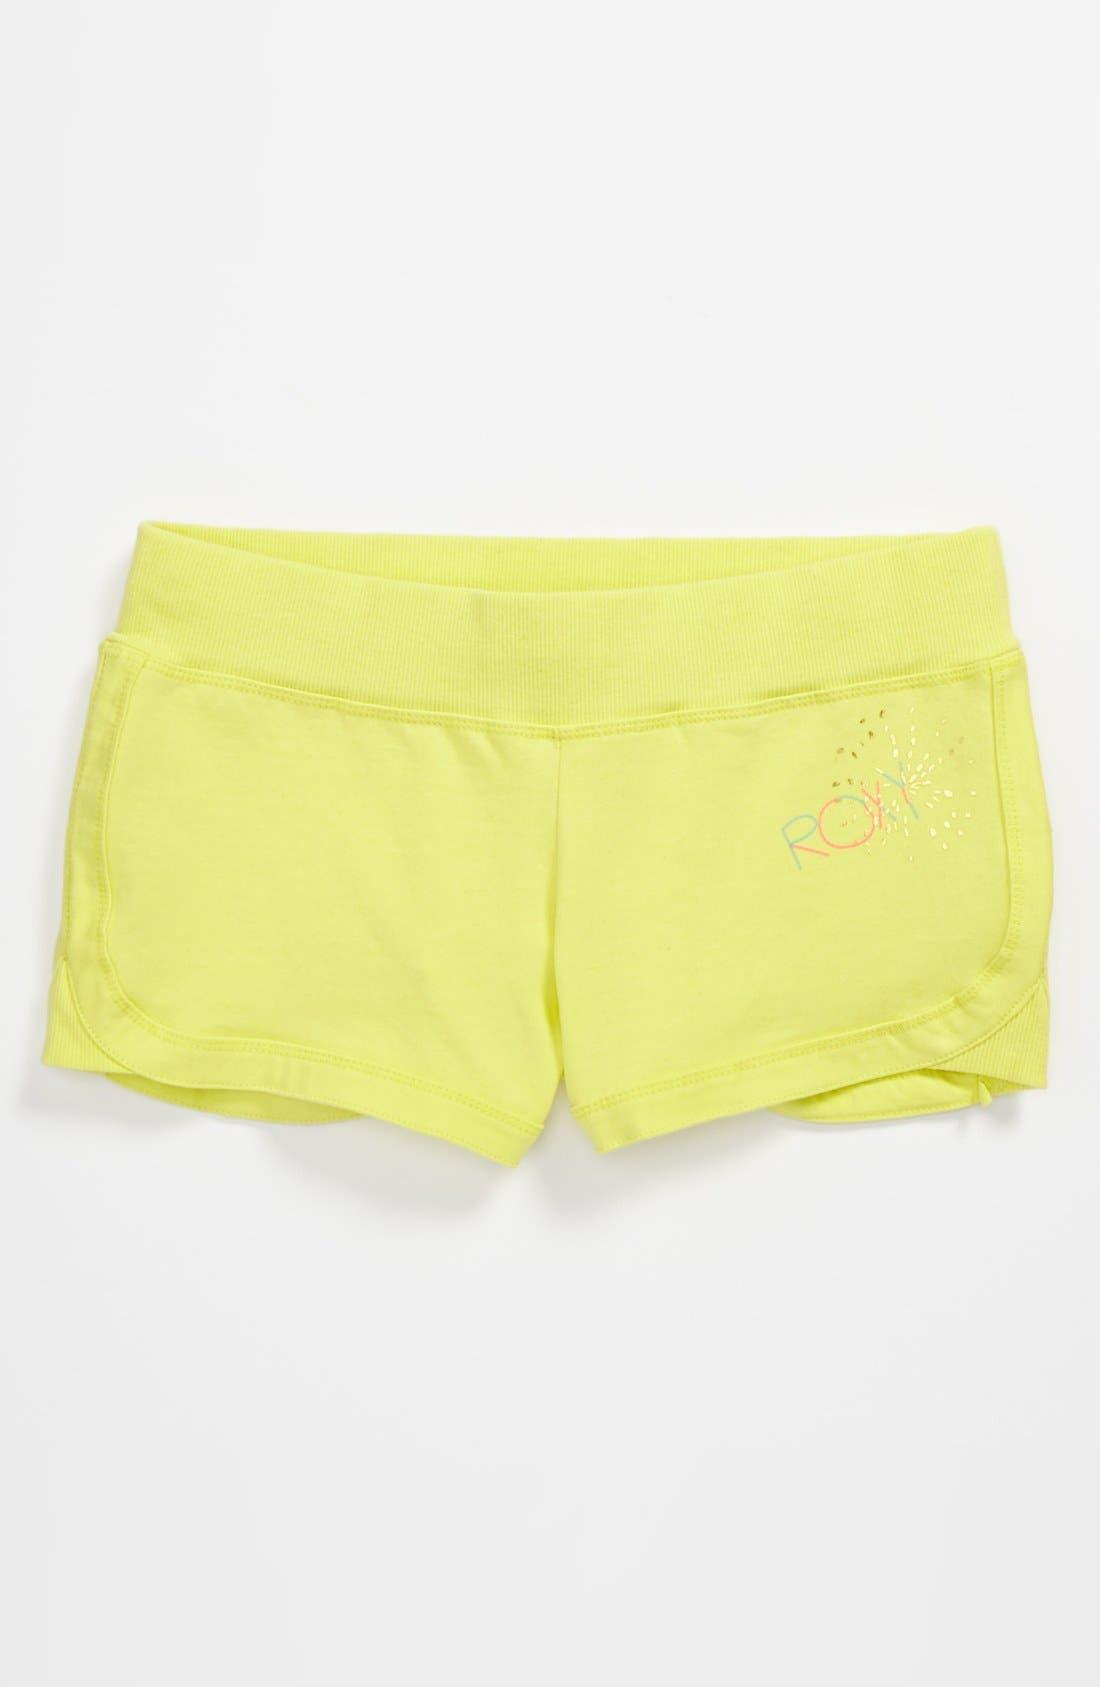 Alternate Image 1 Selected - Knit Shorts (Big Girls)